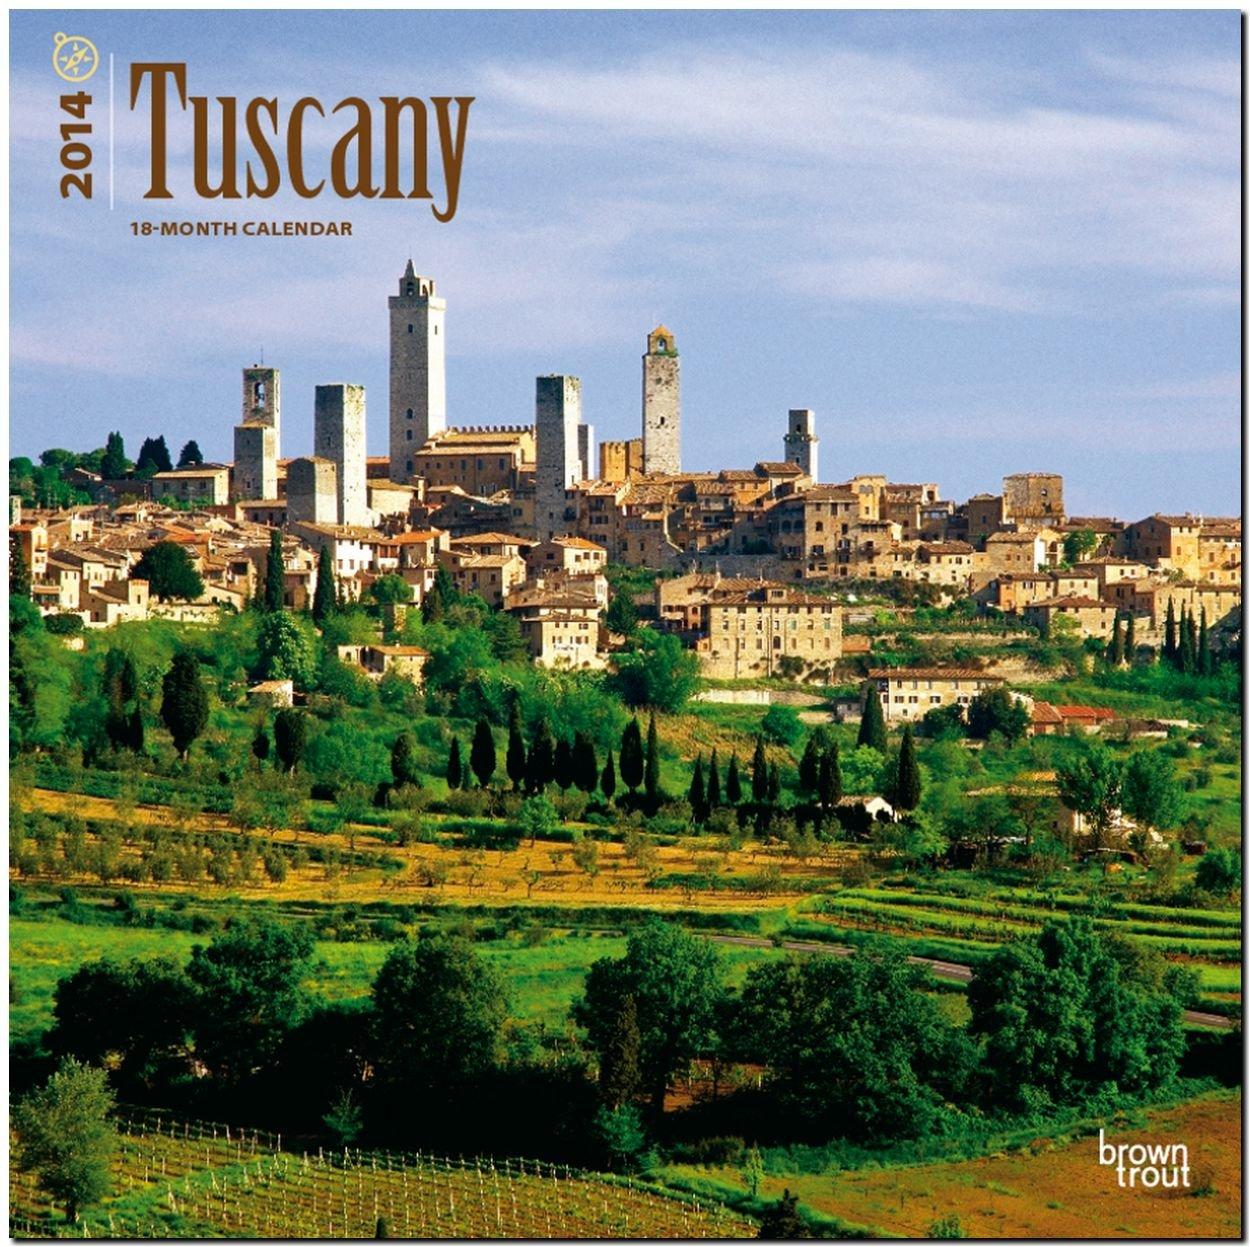 Tuscany 2014 - Toskana: Original BrownTrout-Kalender [Mehrsprachig] [Kalender]